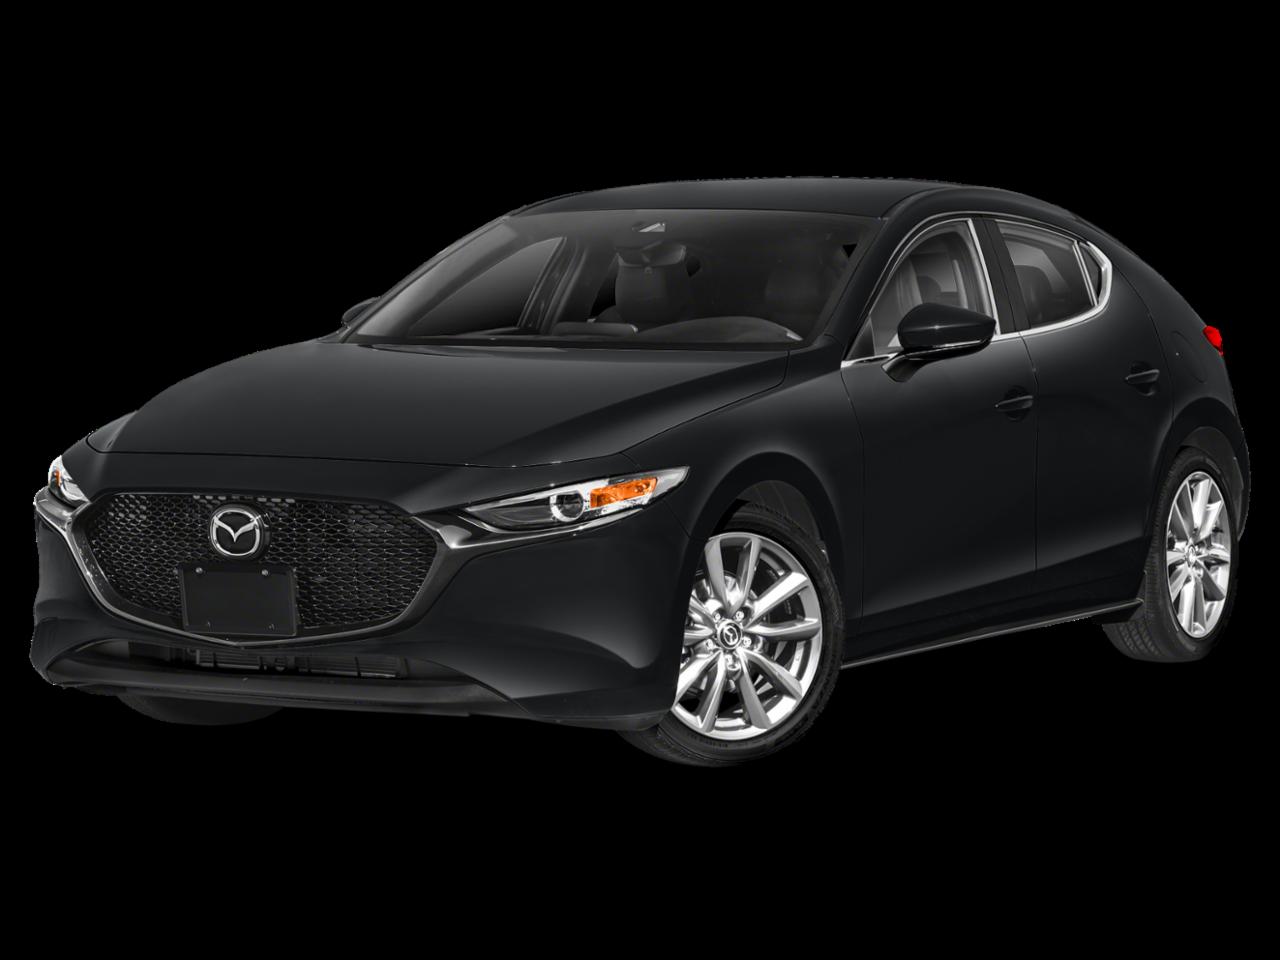 Mazda 2021 Mazda3 Hatchback 2.5 S